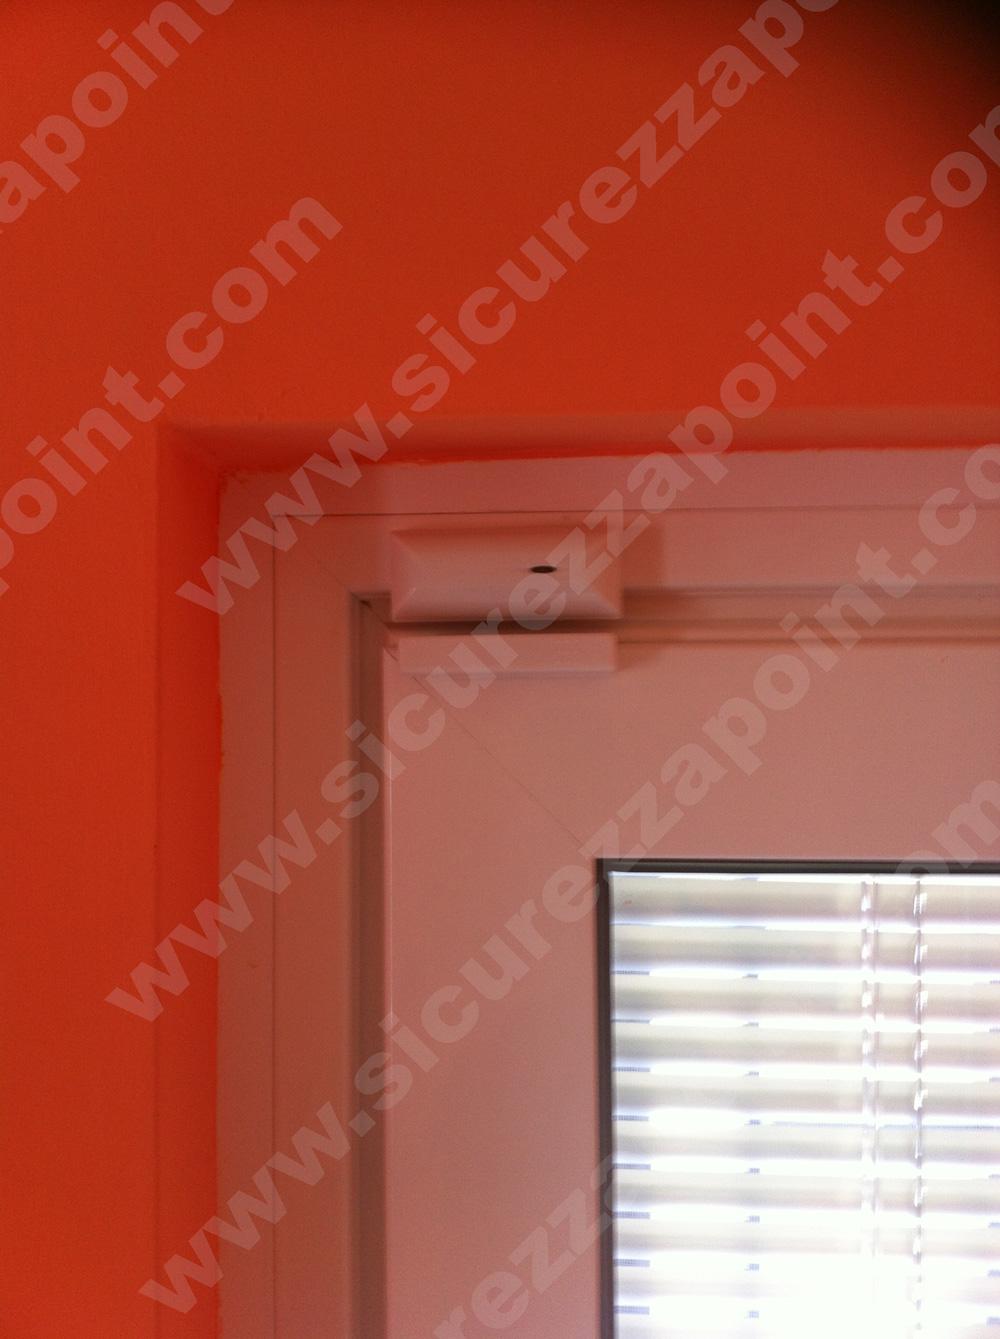 sensore porta finestra